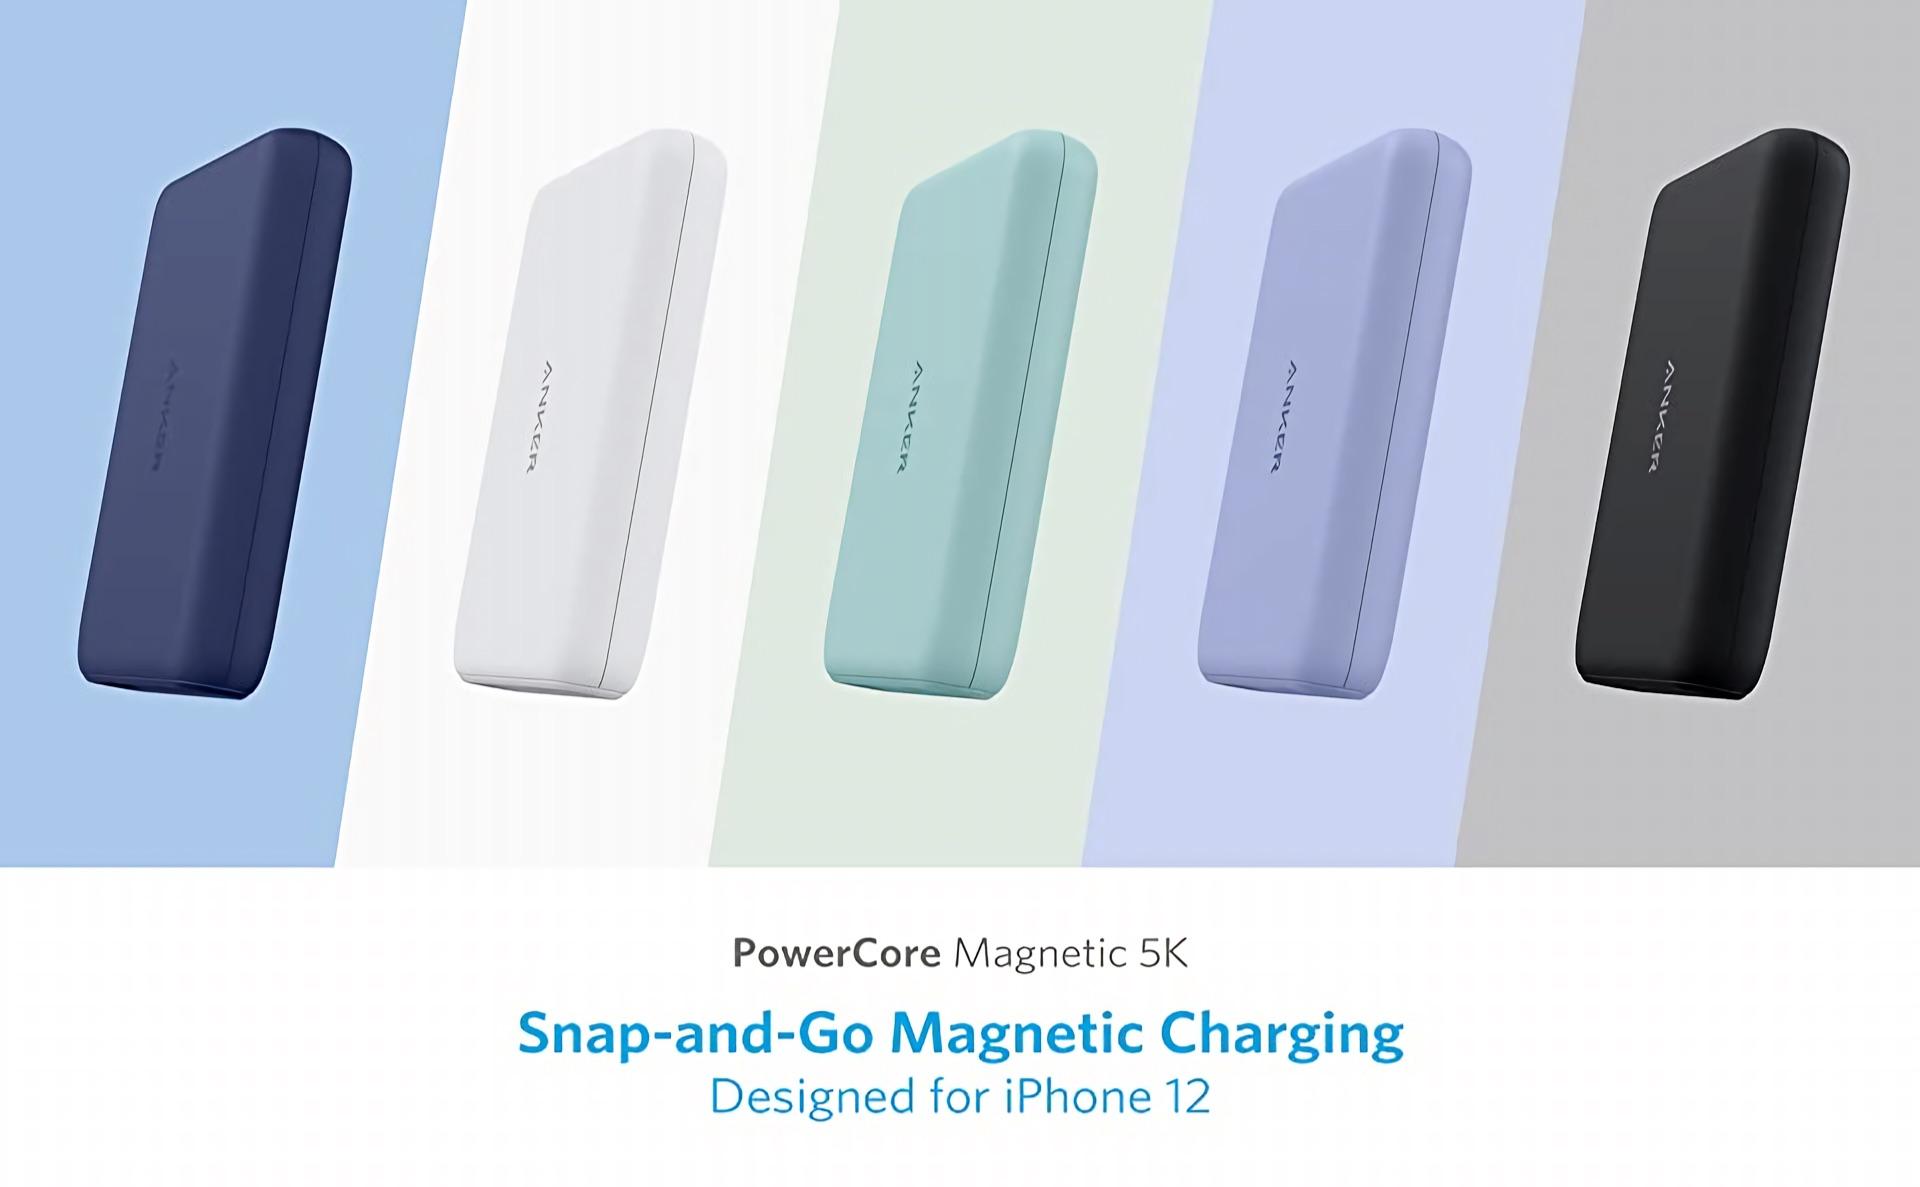 Anker PowerCore Magnetic 5K